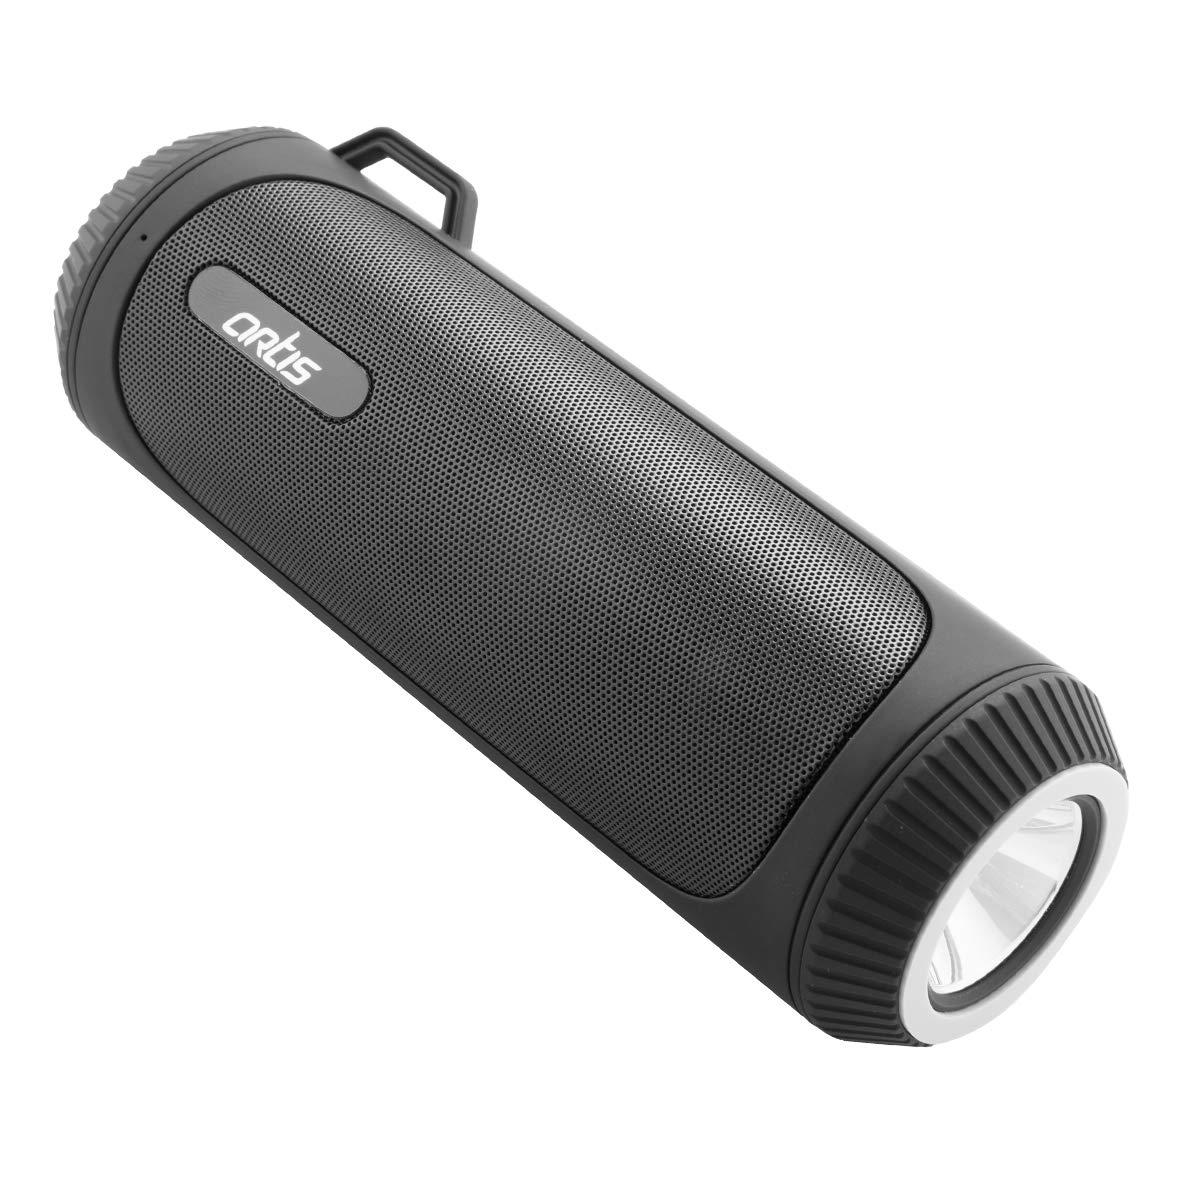 Artis BT22 Portable Wireless Bluetooth Speaker with LED Flash Light